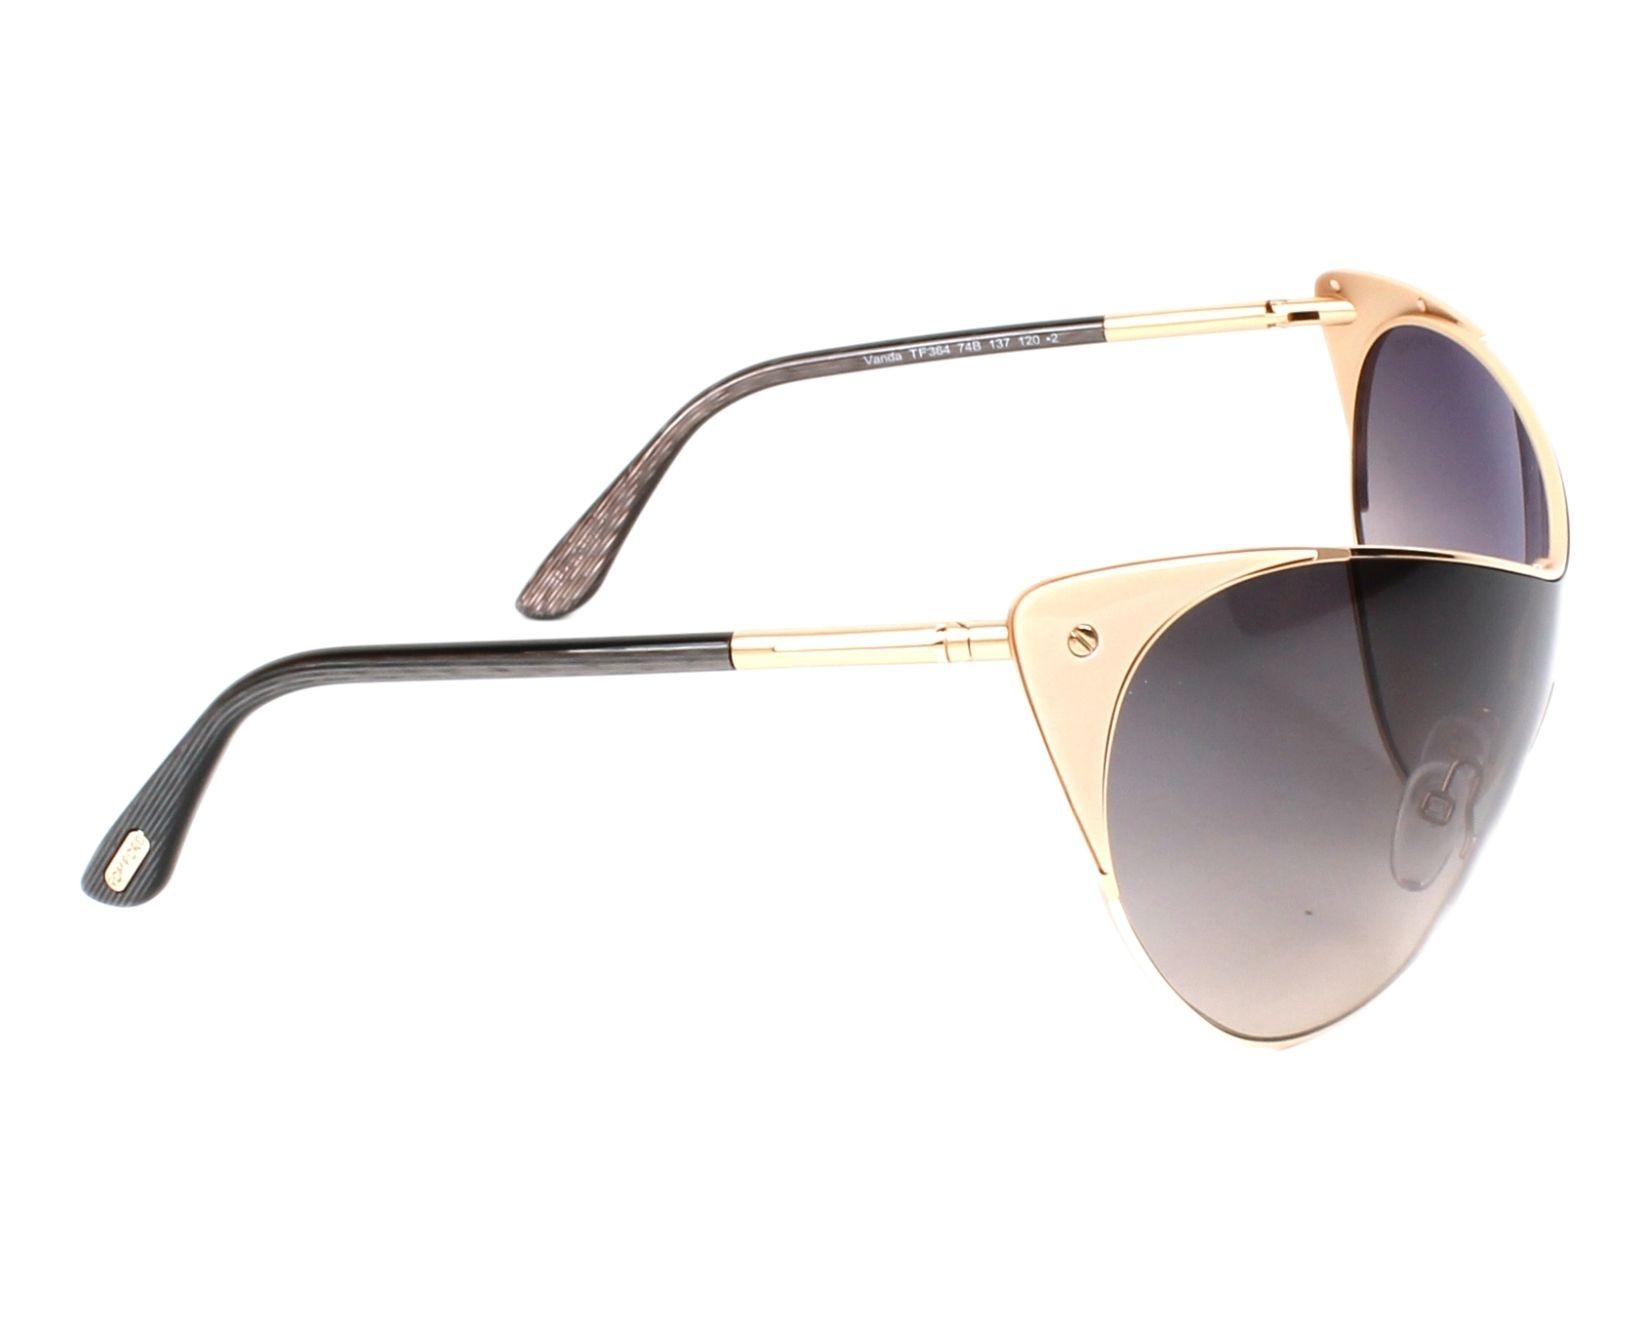 adba54d3840b Sunglasses Tom Ford TF-0364 74B - Gold Rosa side view